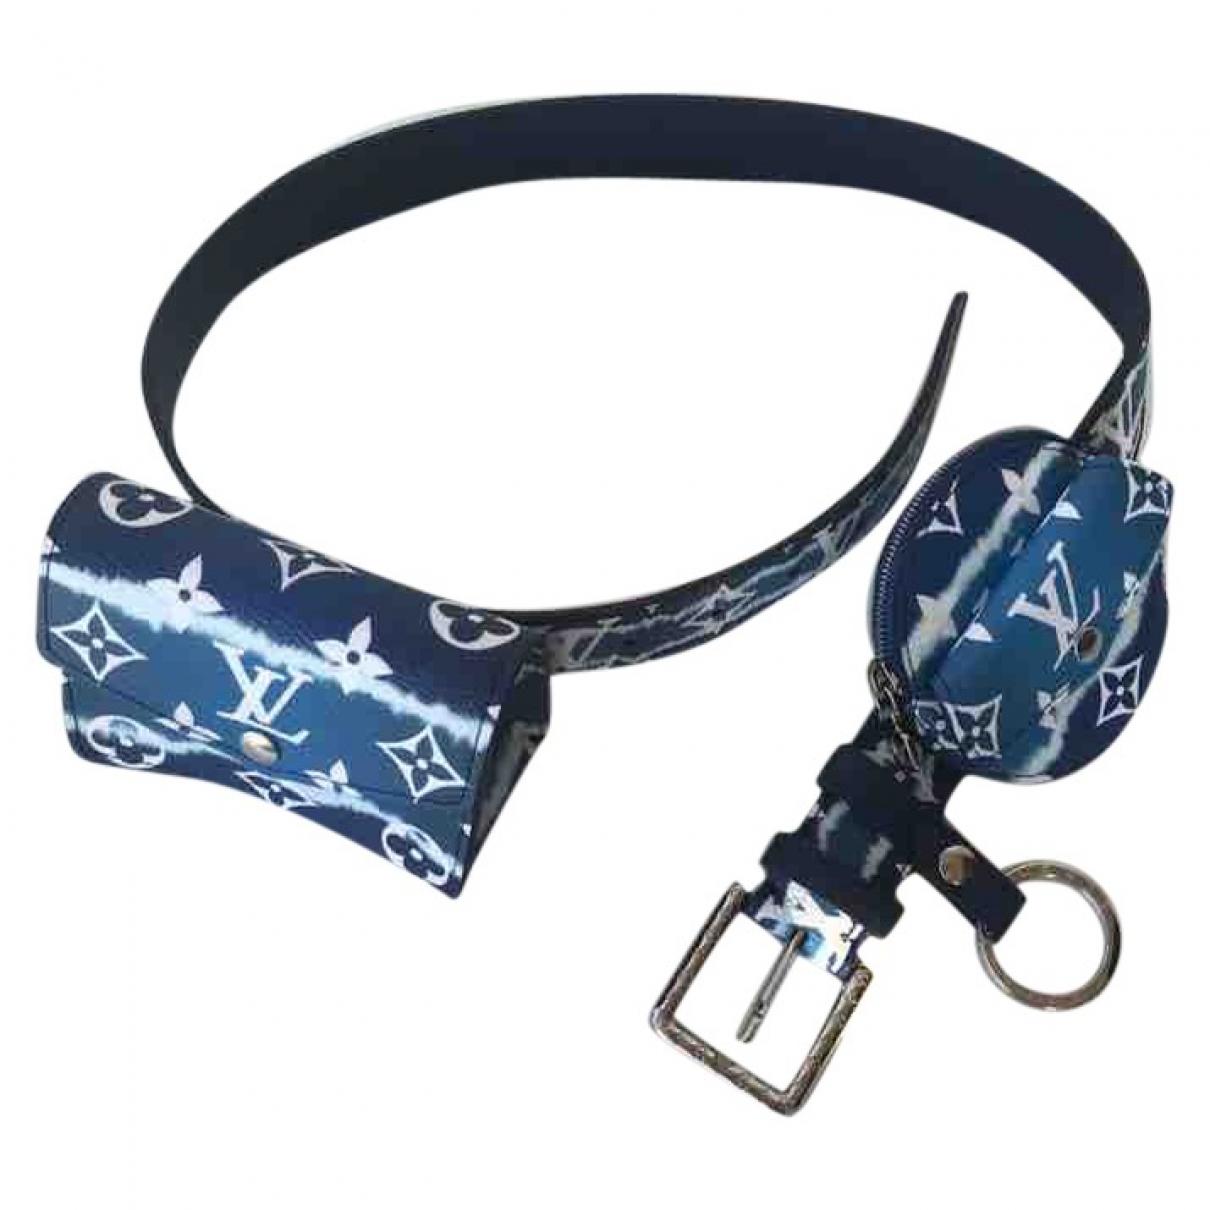 Cinturon Daily multi pocket de Lona Louis Vuitton